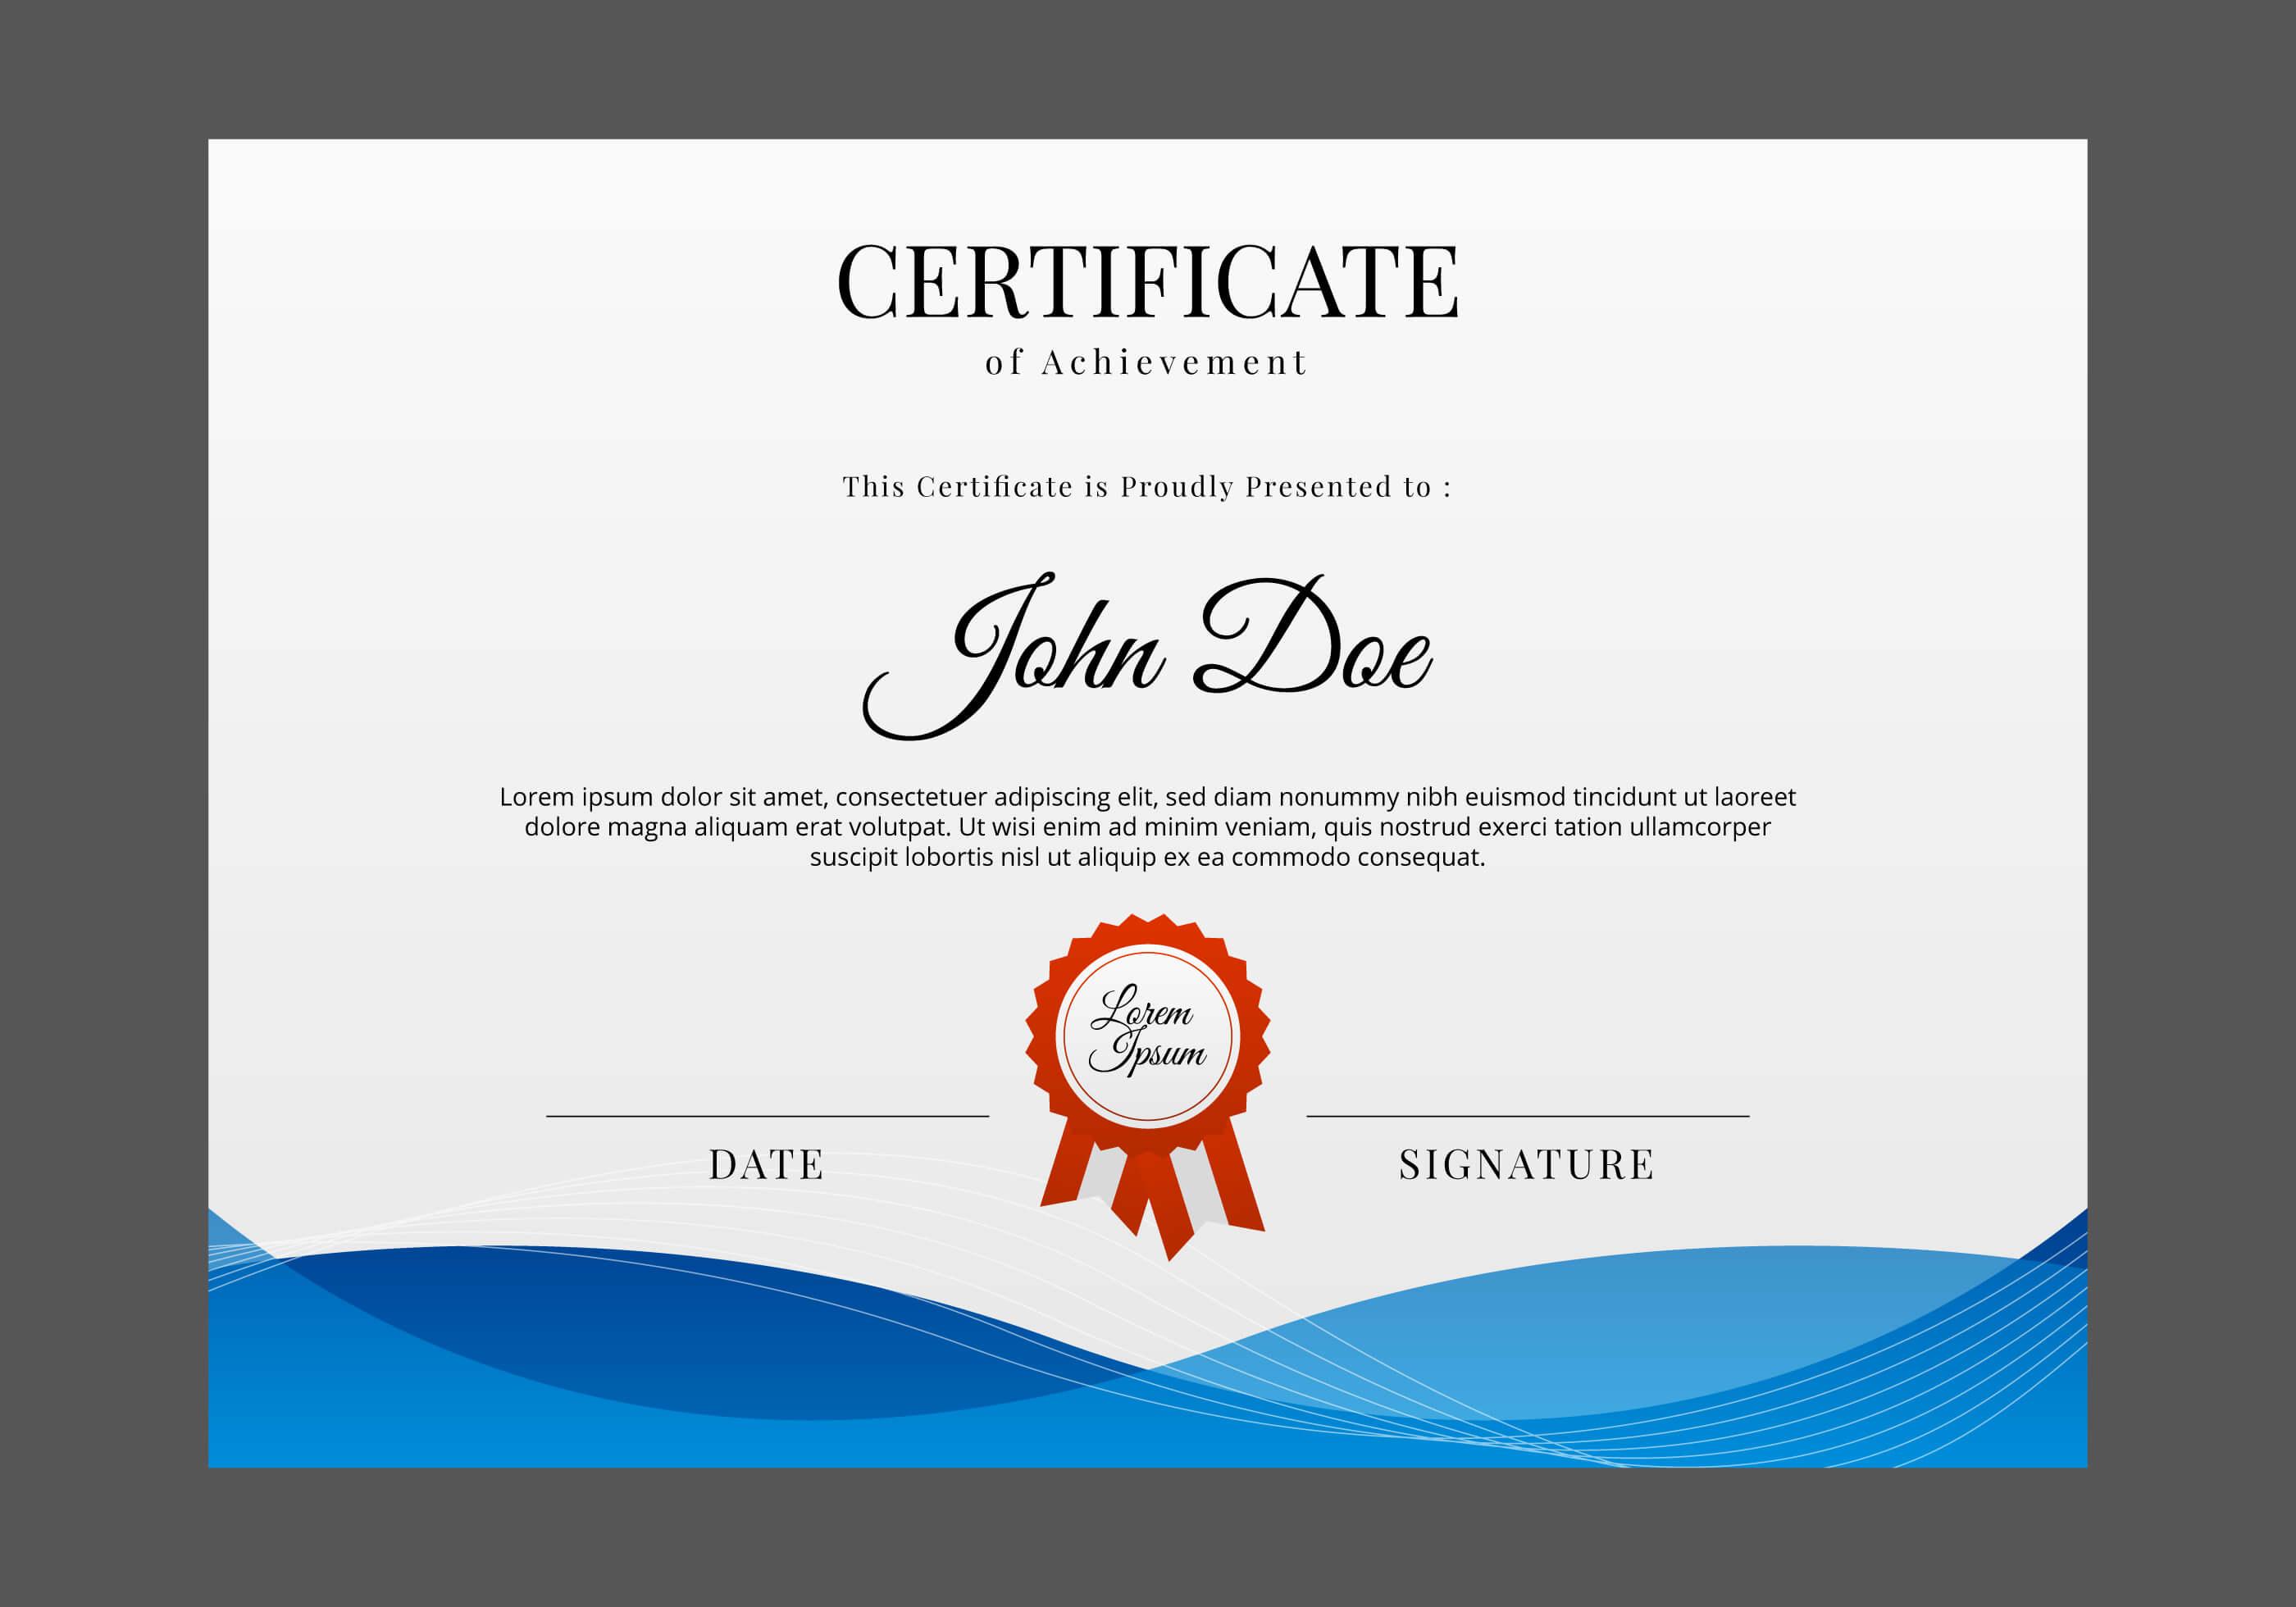 Certificate Design Free Vector Art - (10,209 Free Downloads) inside Design A Certificate Template